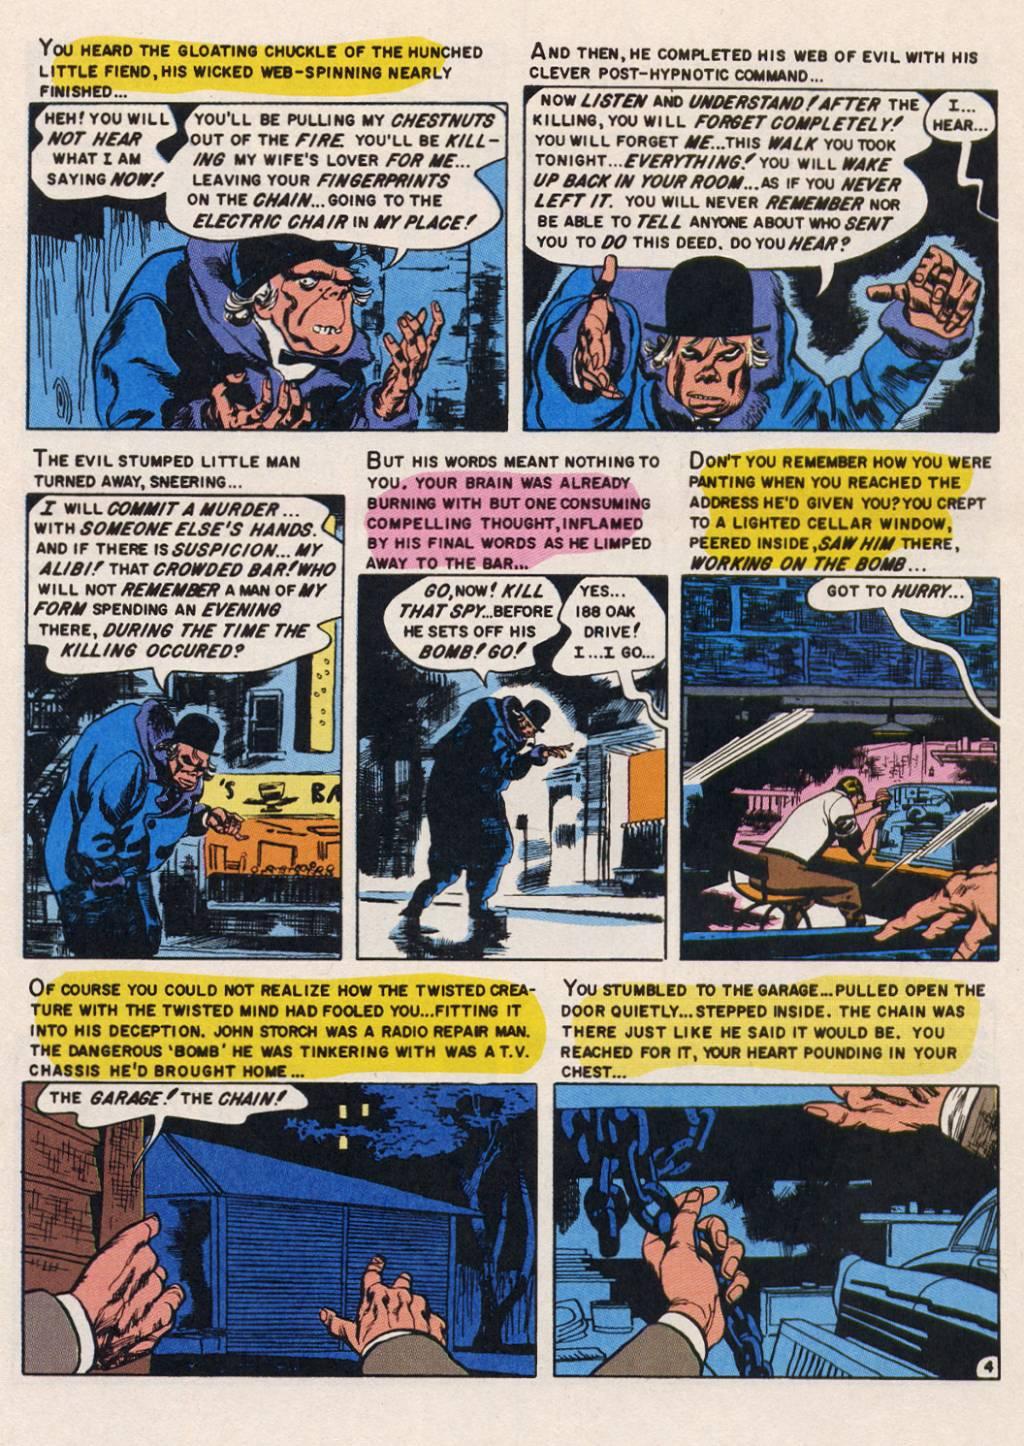 Read online Shock SuspenStories comic -  Issue #14 - 21